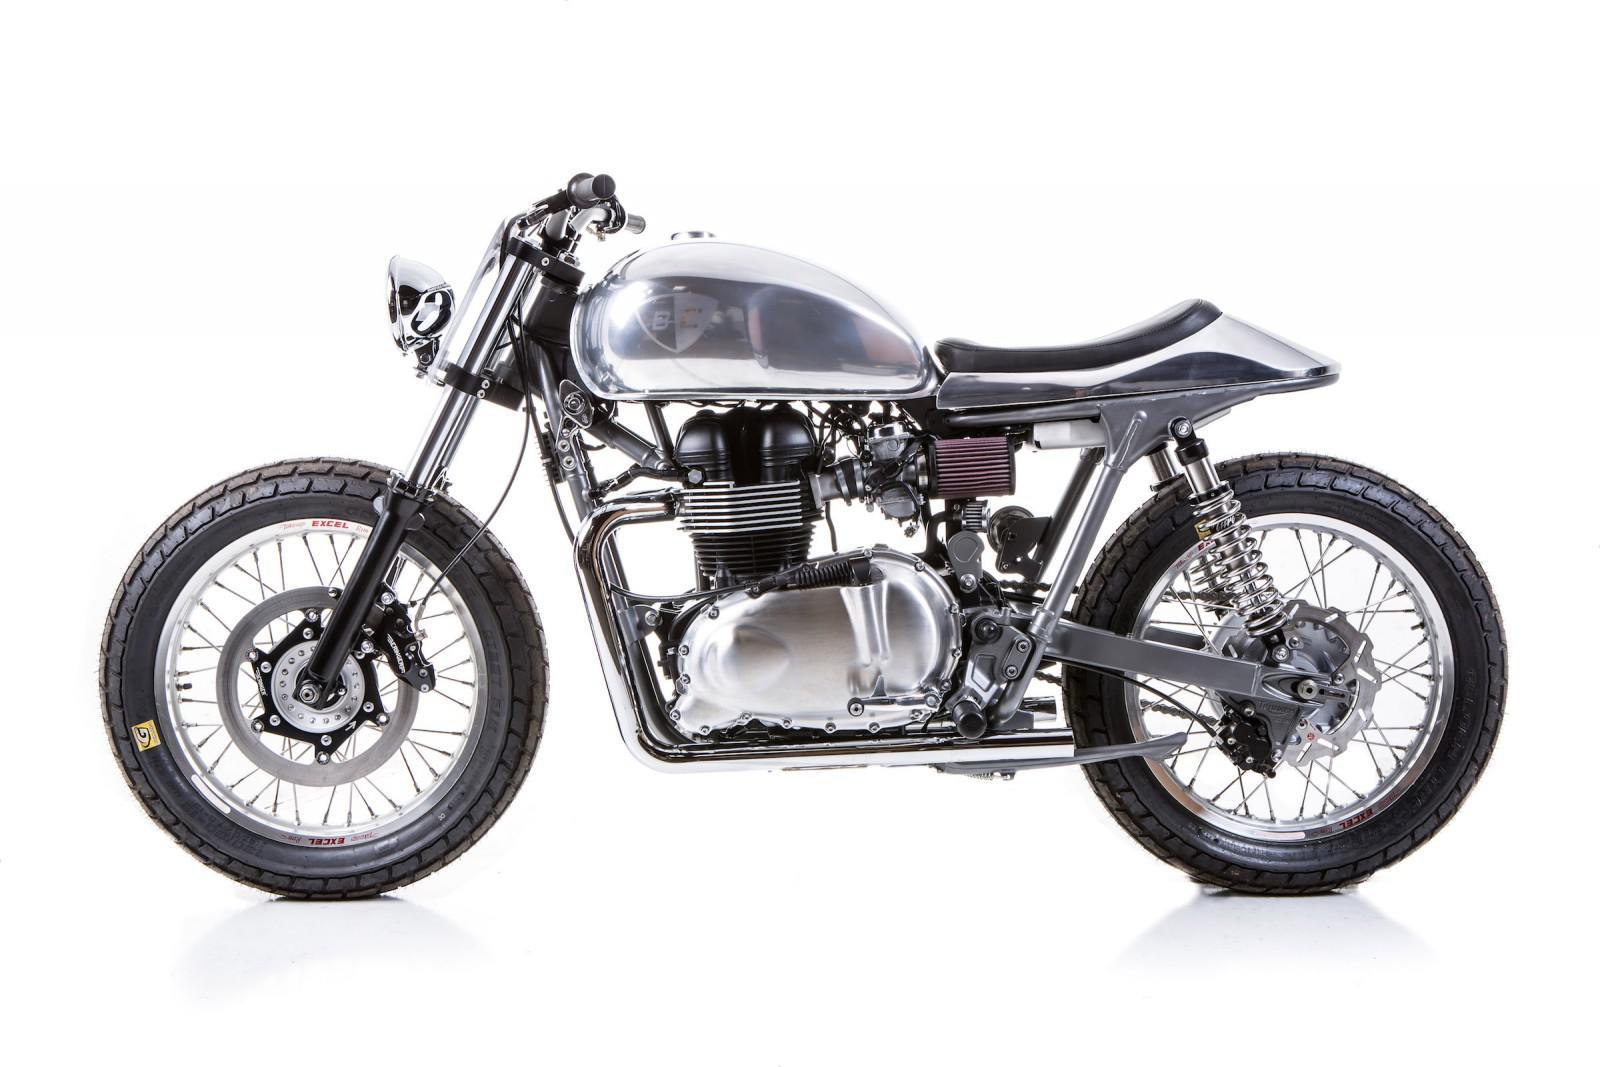 triumph bonneville british customs motorrad fotos. Black Bedroom Furniture Sets. Home Design Ideas